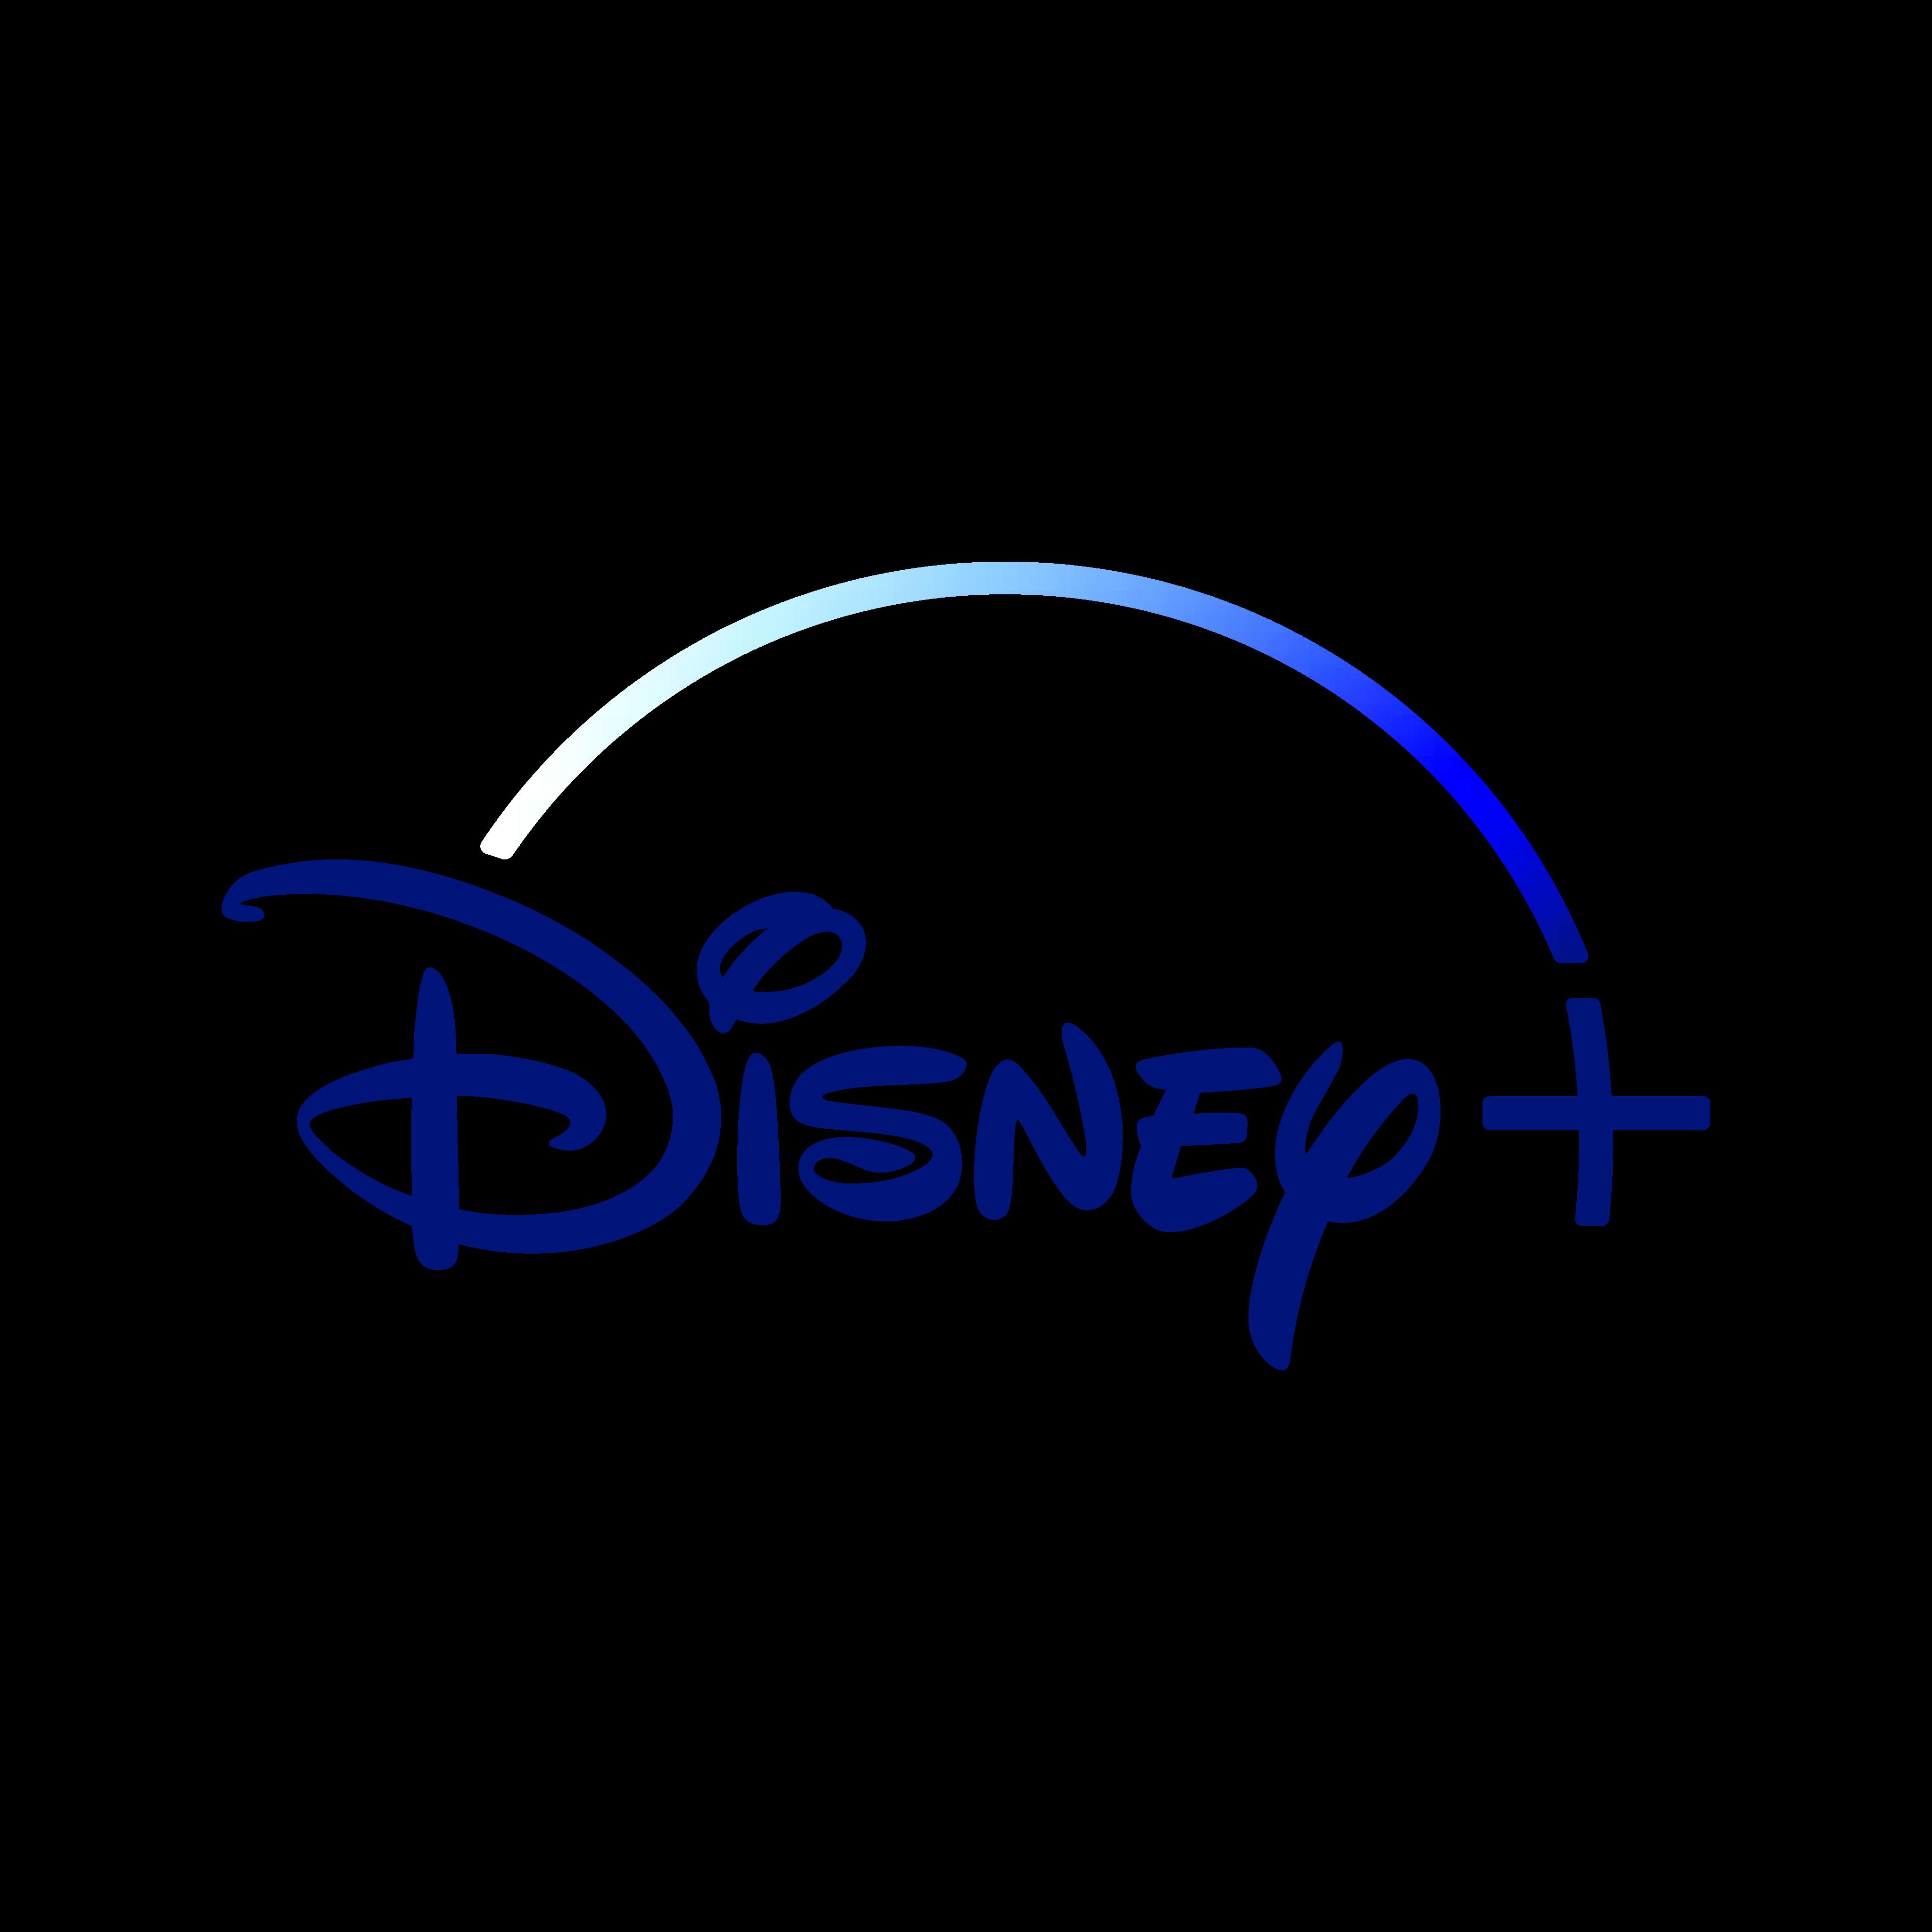 disney plus logo 0 - Disney+ Logo